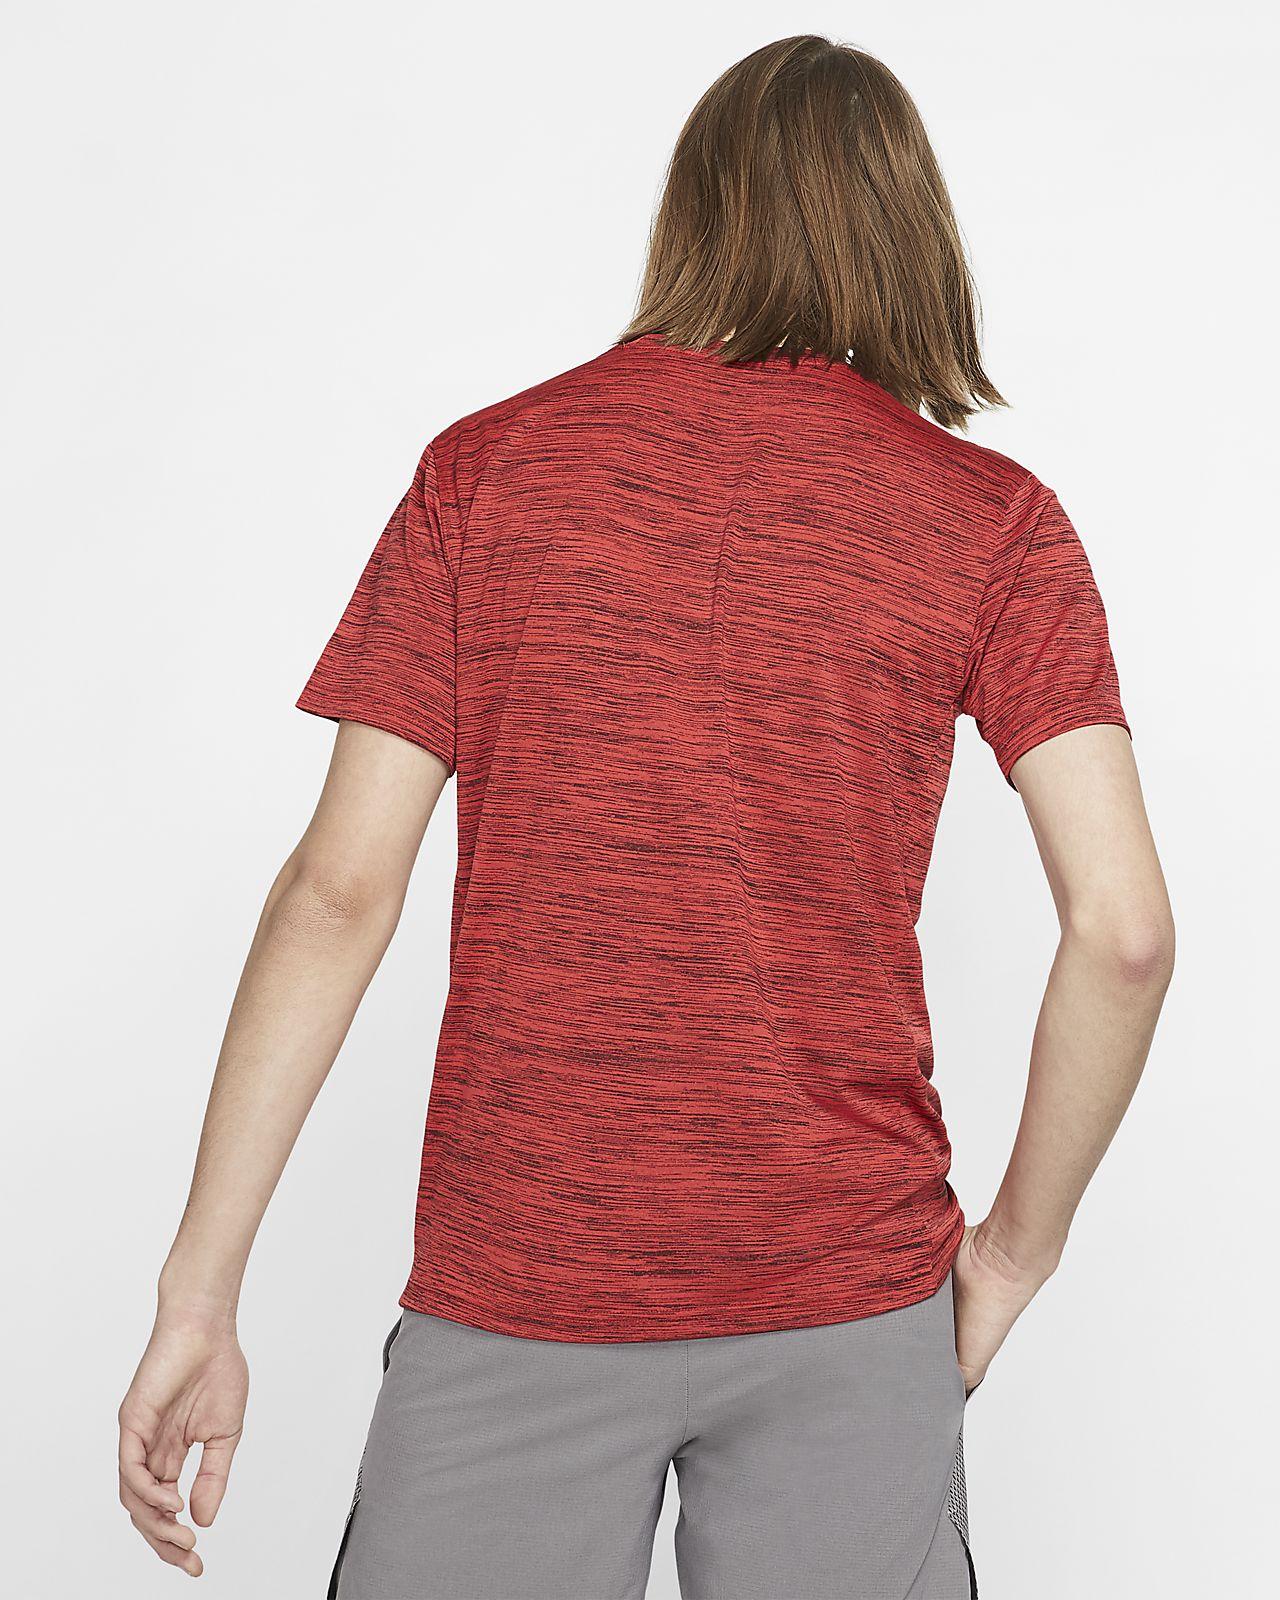 1fbbeefb5 ... Nike College Dri-FIT Legend Velocity (Ohio State) Men's T-Shirt